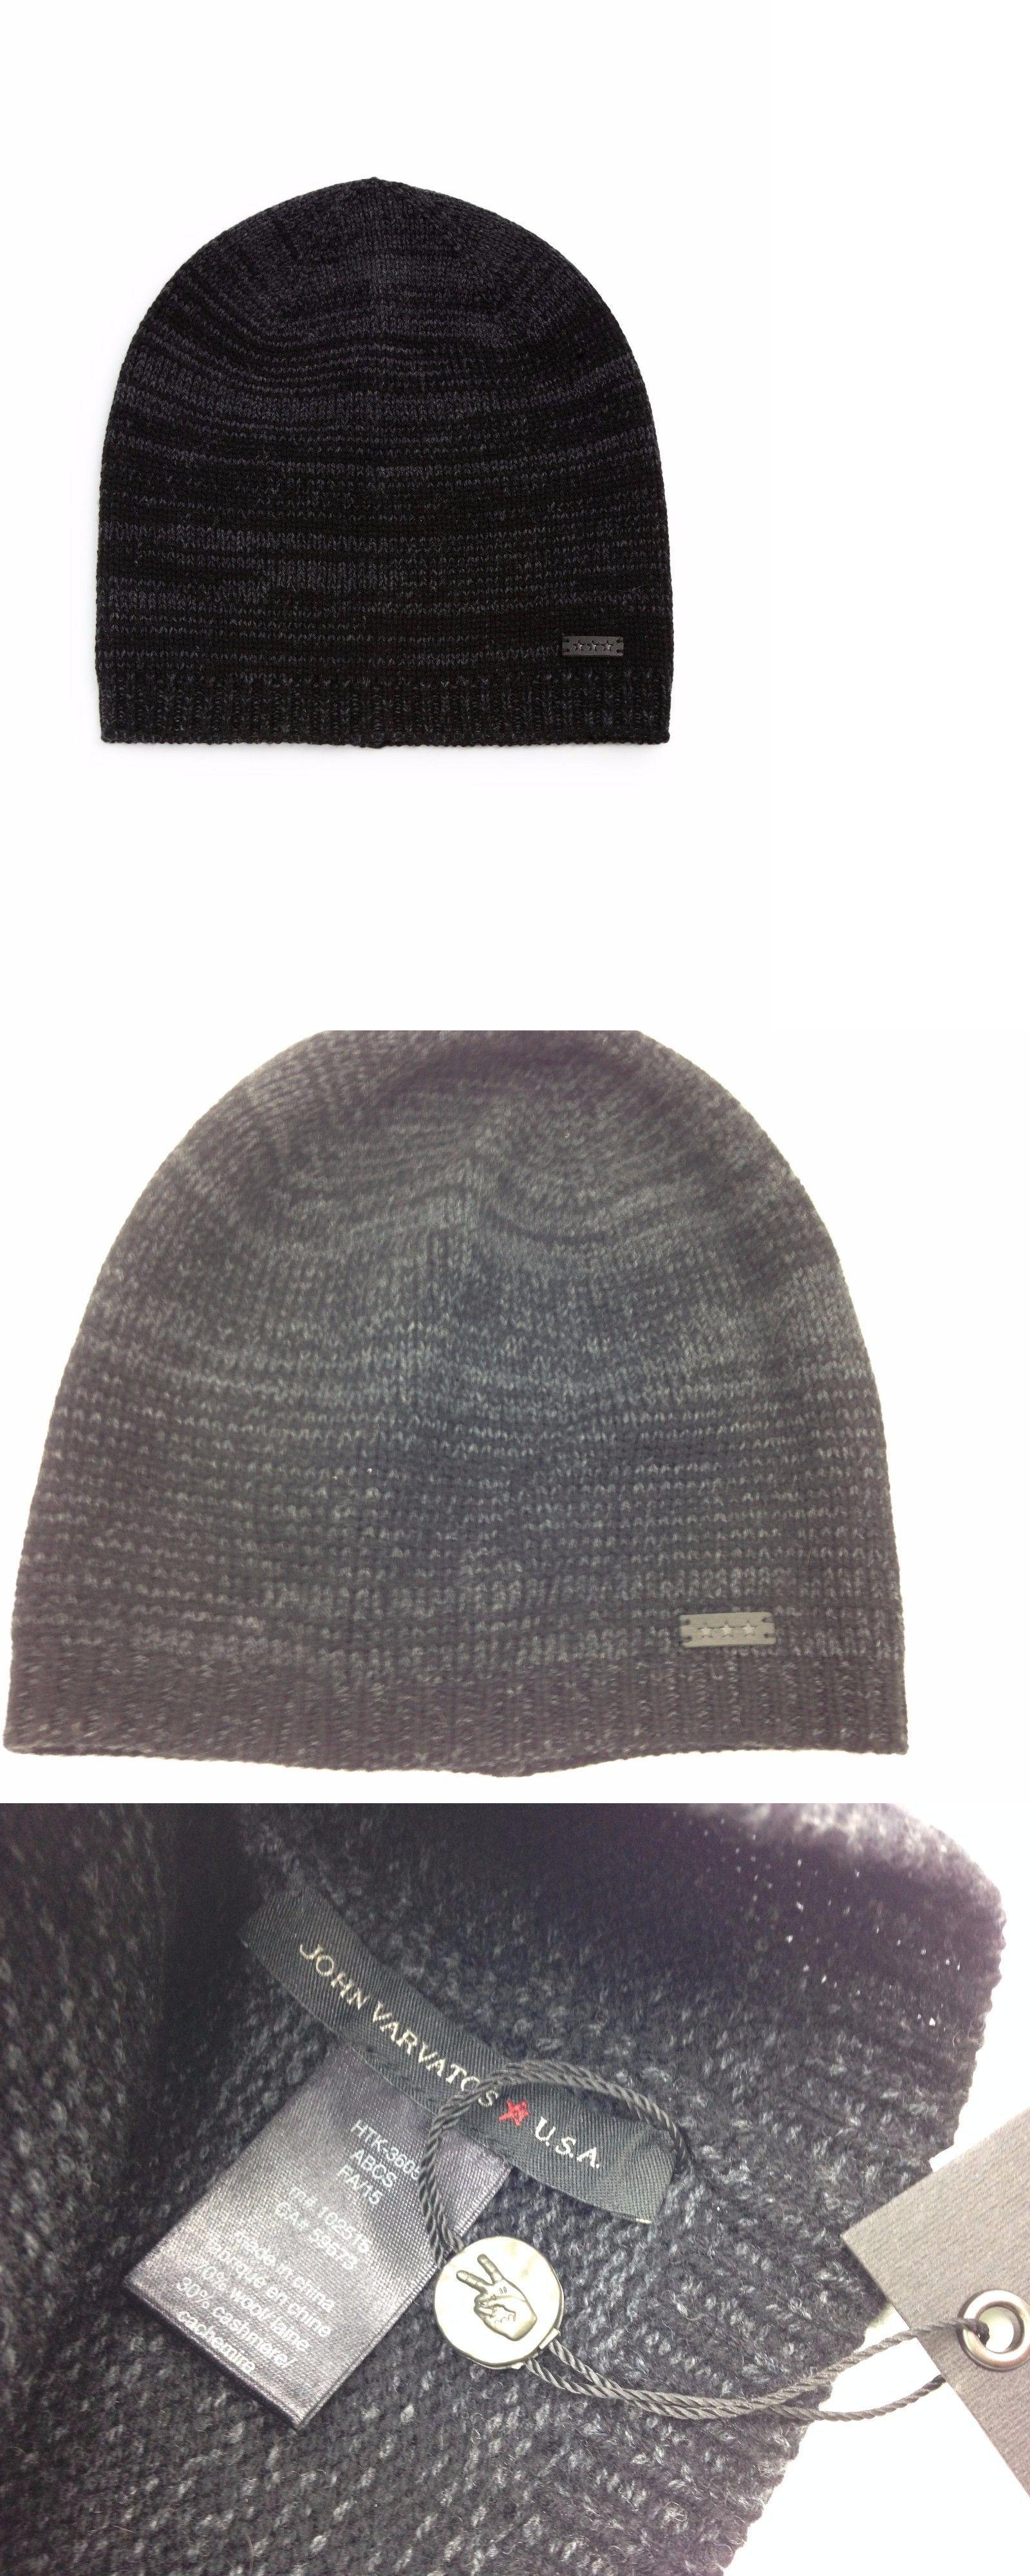 Hats 57884   180 John Varvatos Kids Gray Black Cap Hat Winter Warm Wool  Cashmere Warm 8a332fafdbe